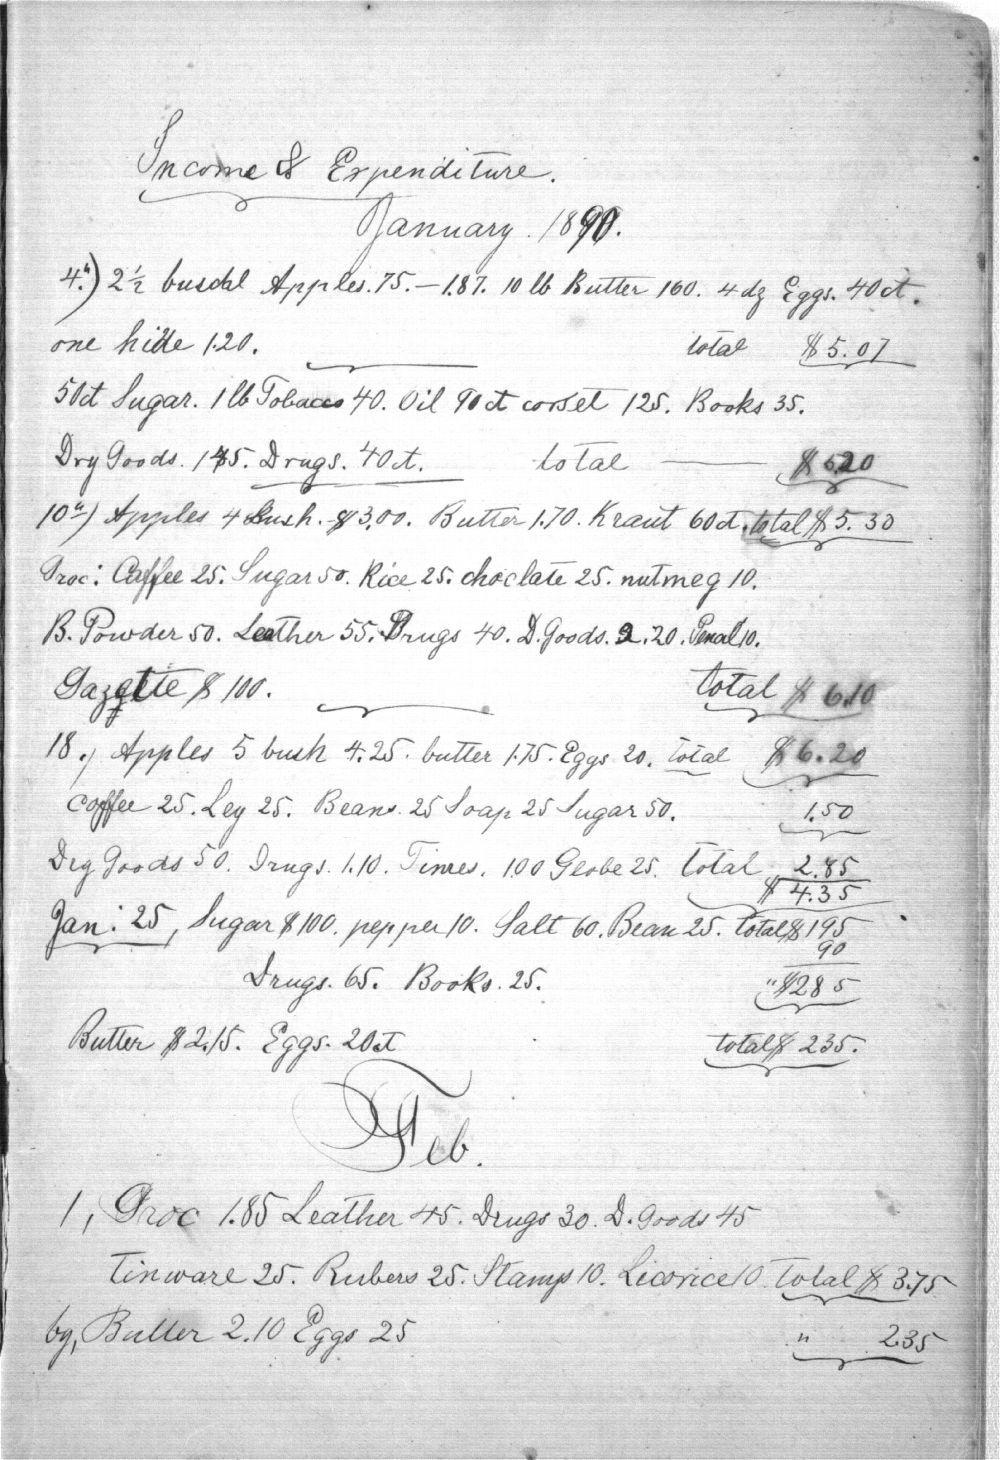 Augusta Bruchmiller memorandum book - 1